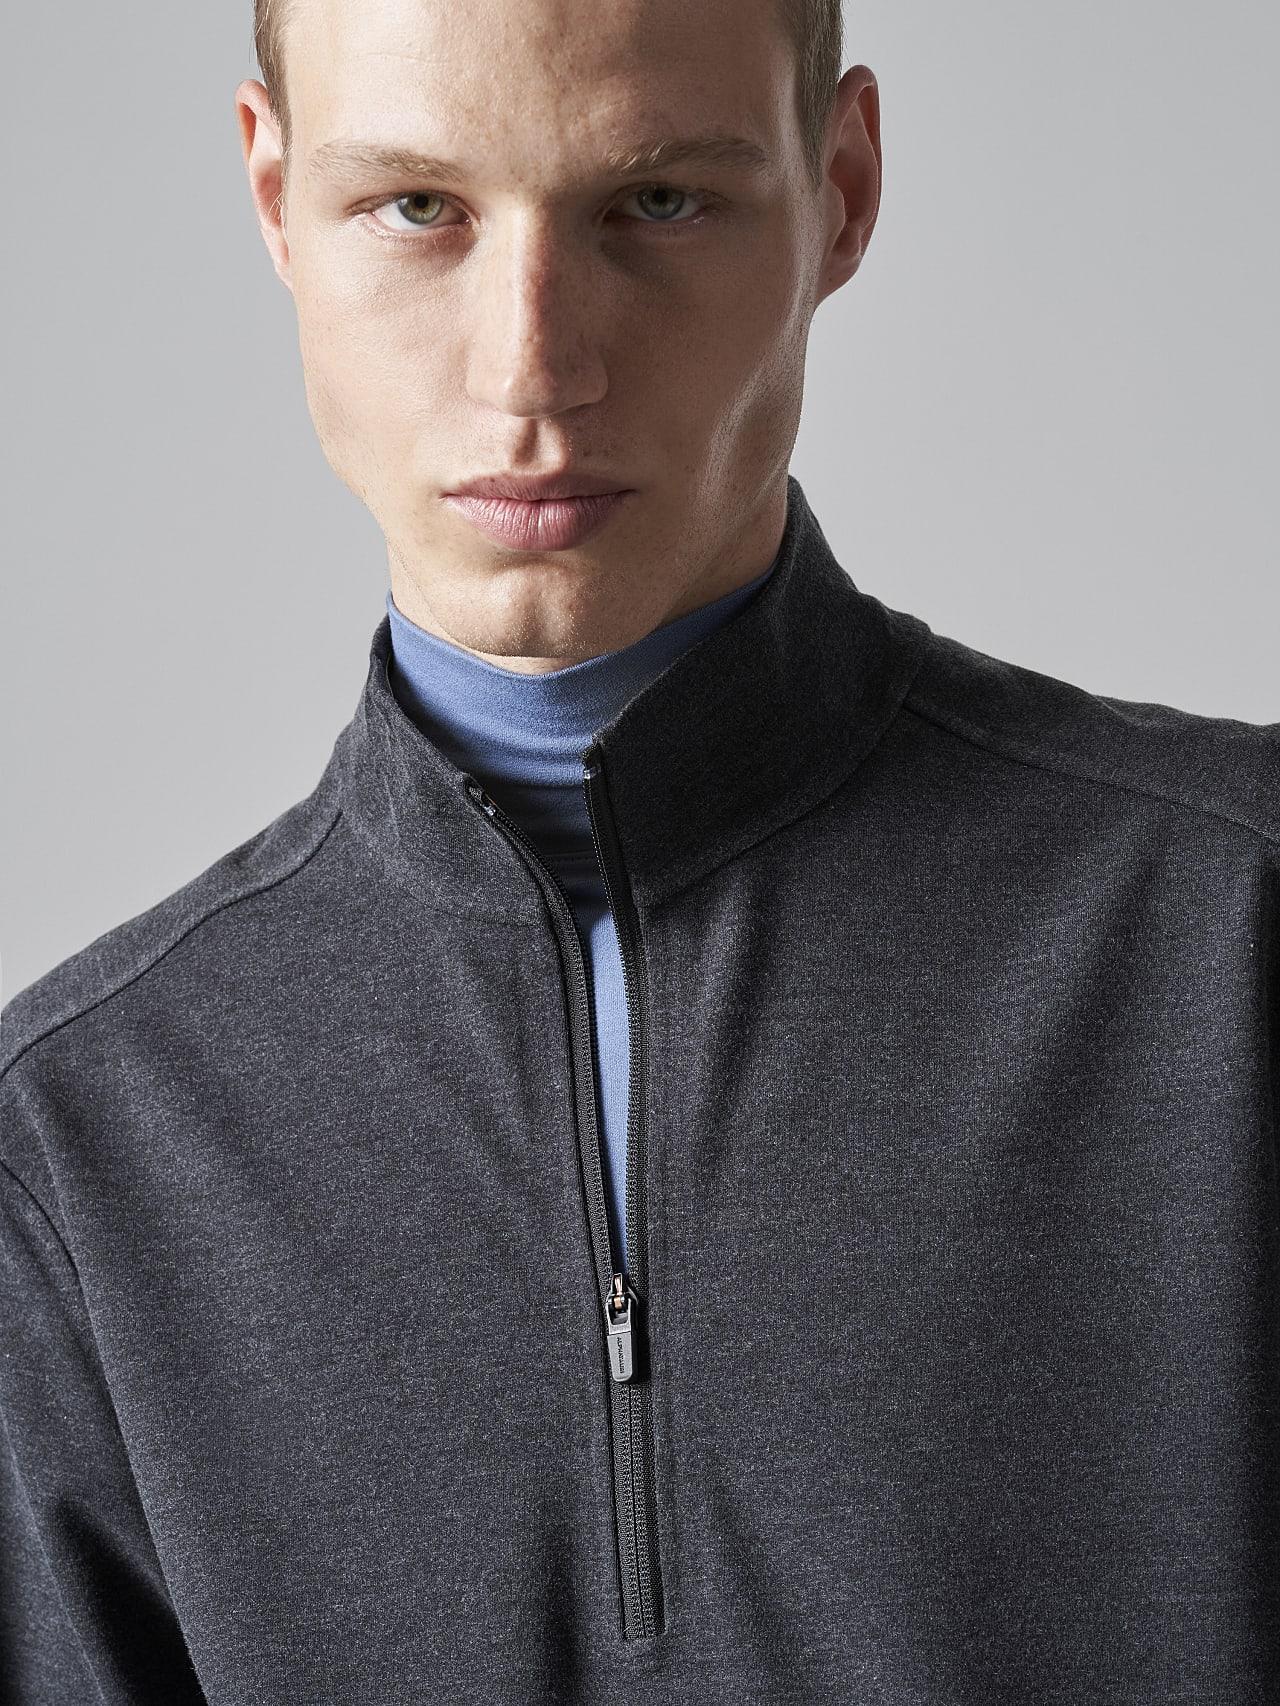 SROTO V1.Y5.02 Waterproof Half-Zip Sweatshirt dark grey / anthracite Right Alpha Tauri